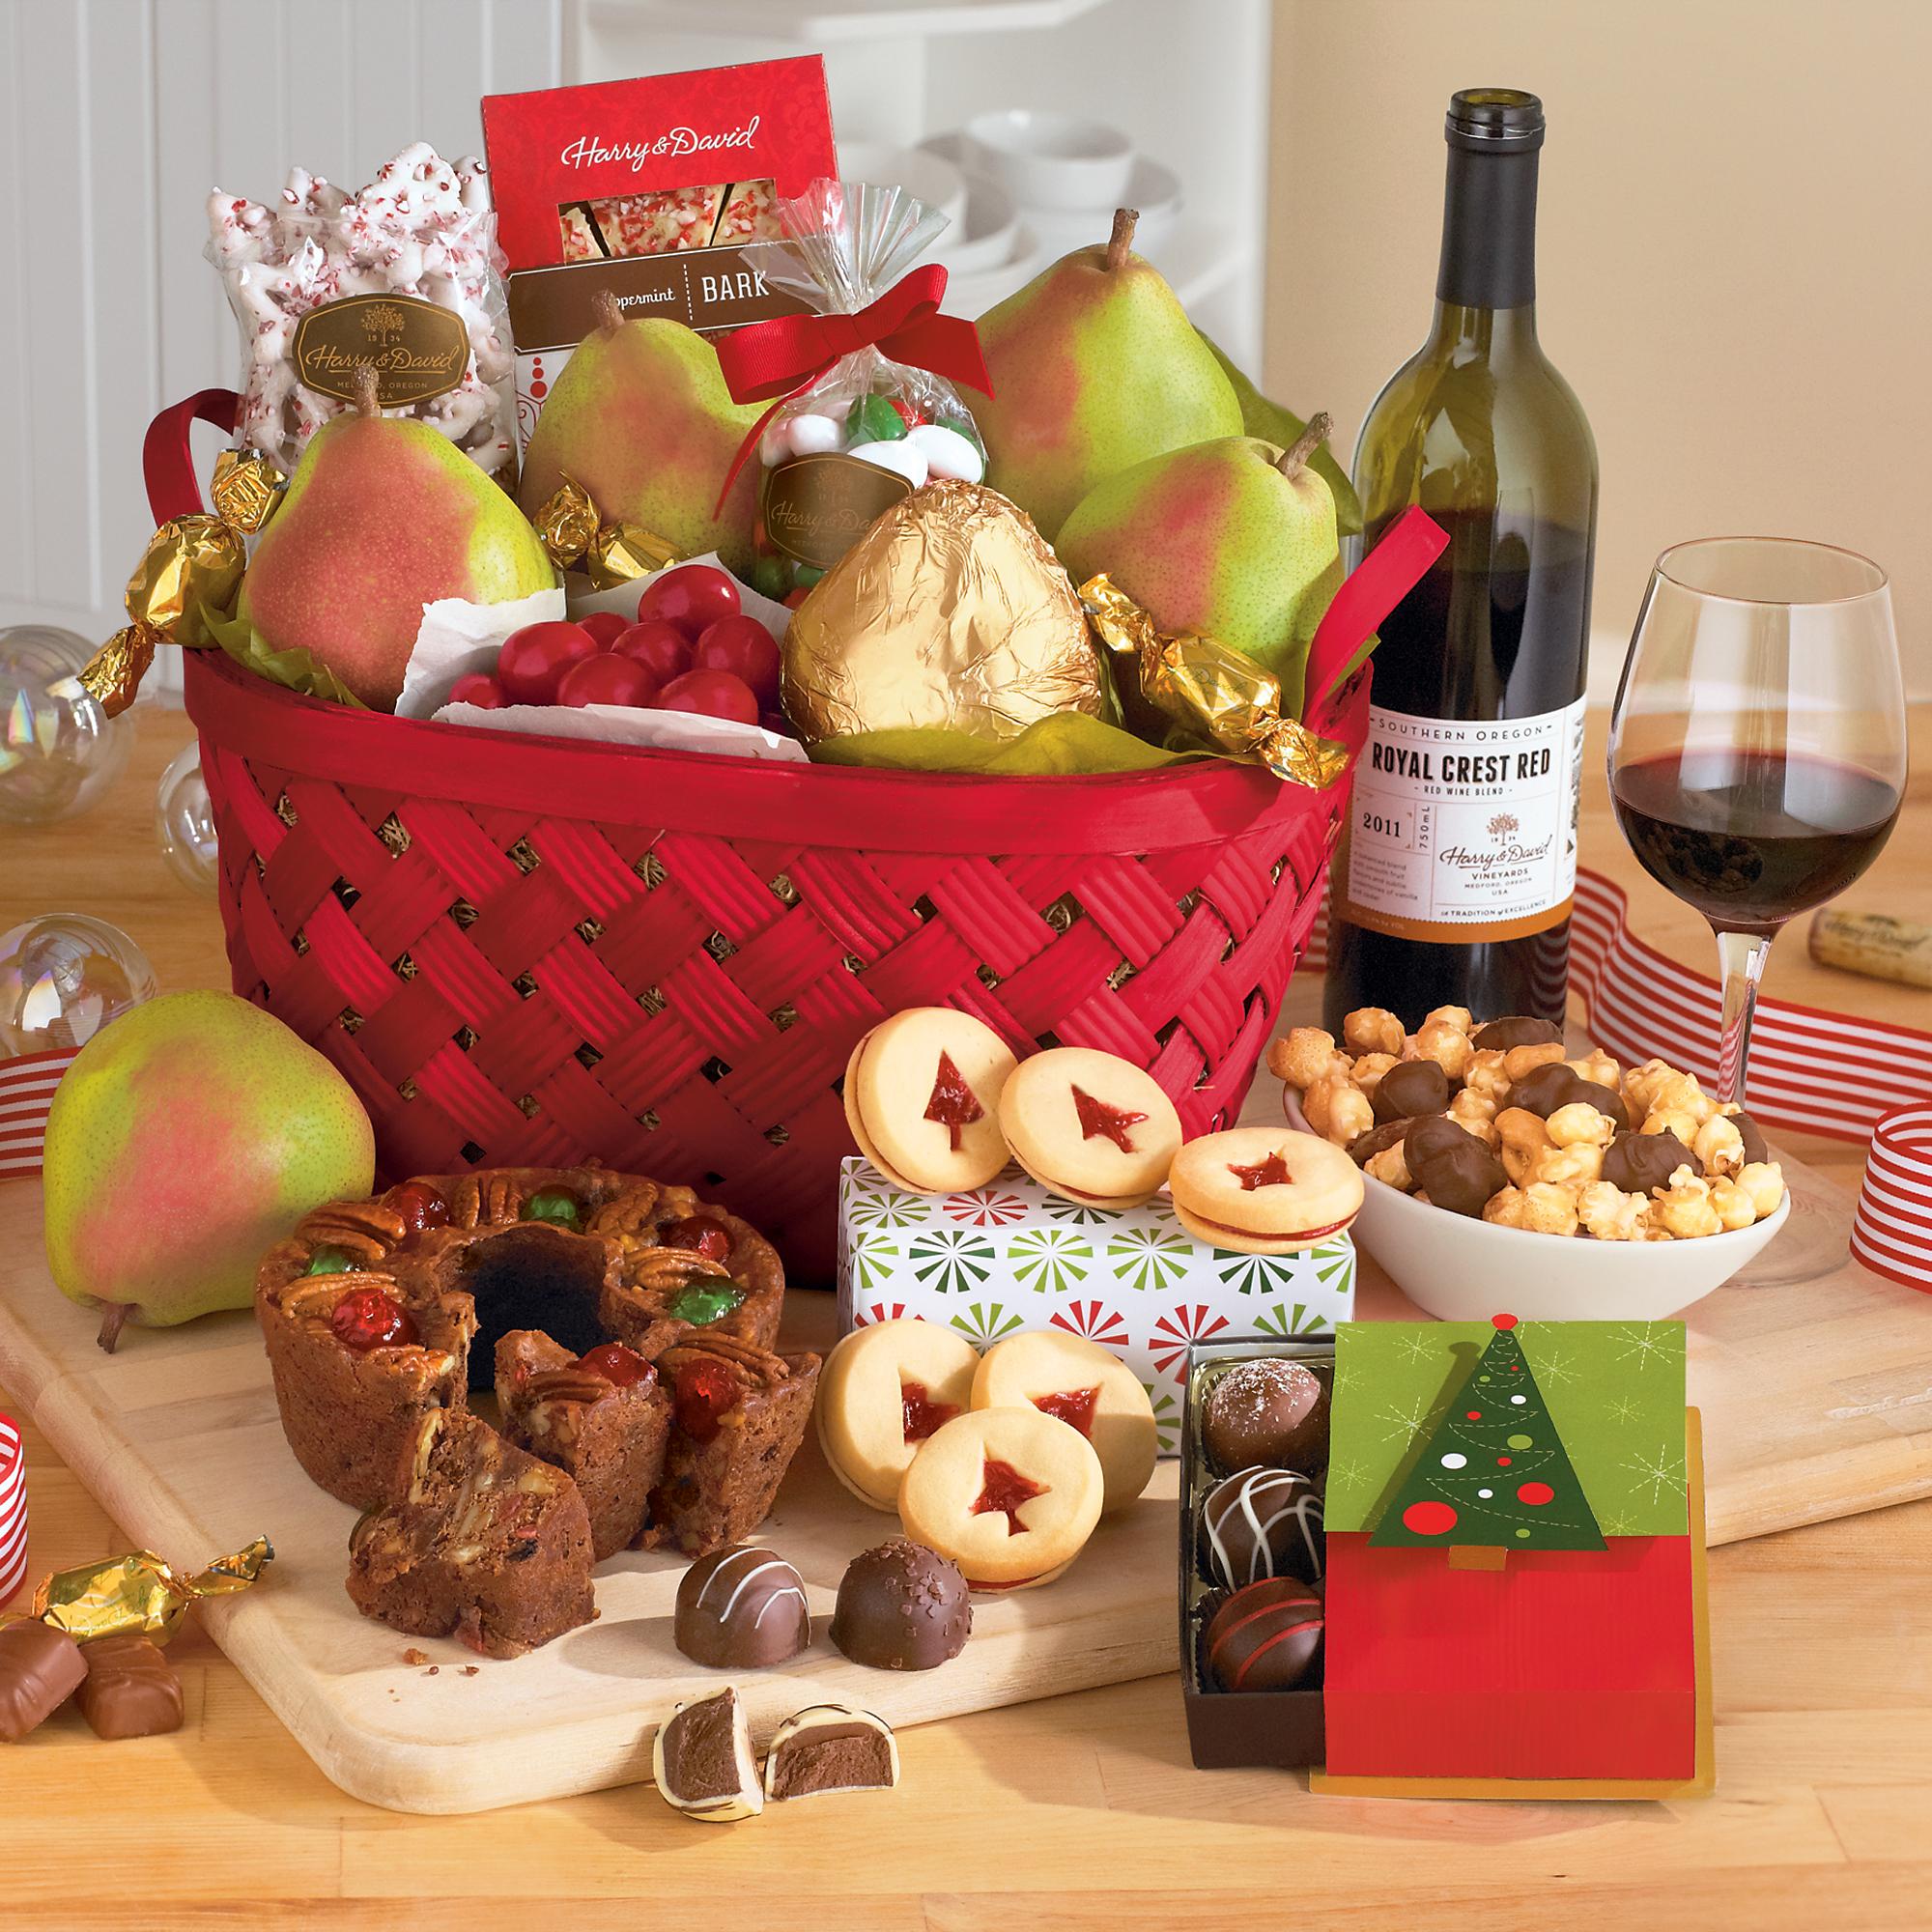 Gift Baskets Free Shipping: Christmas gift baskets free shipping ...